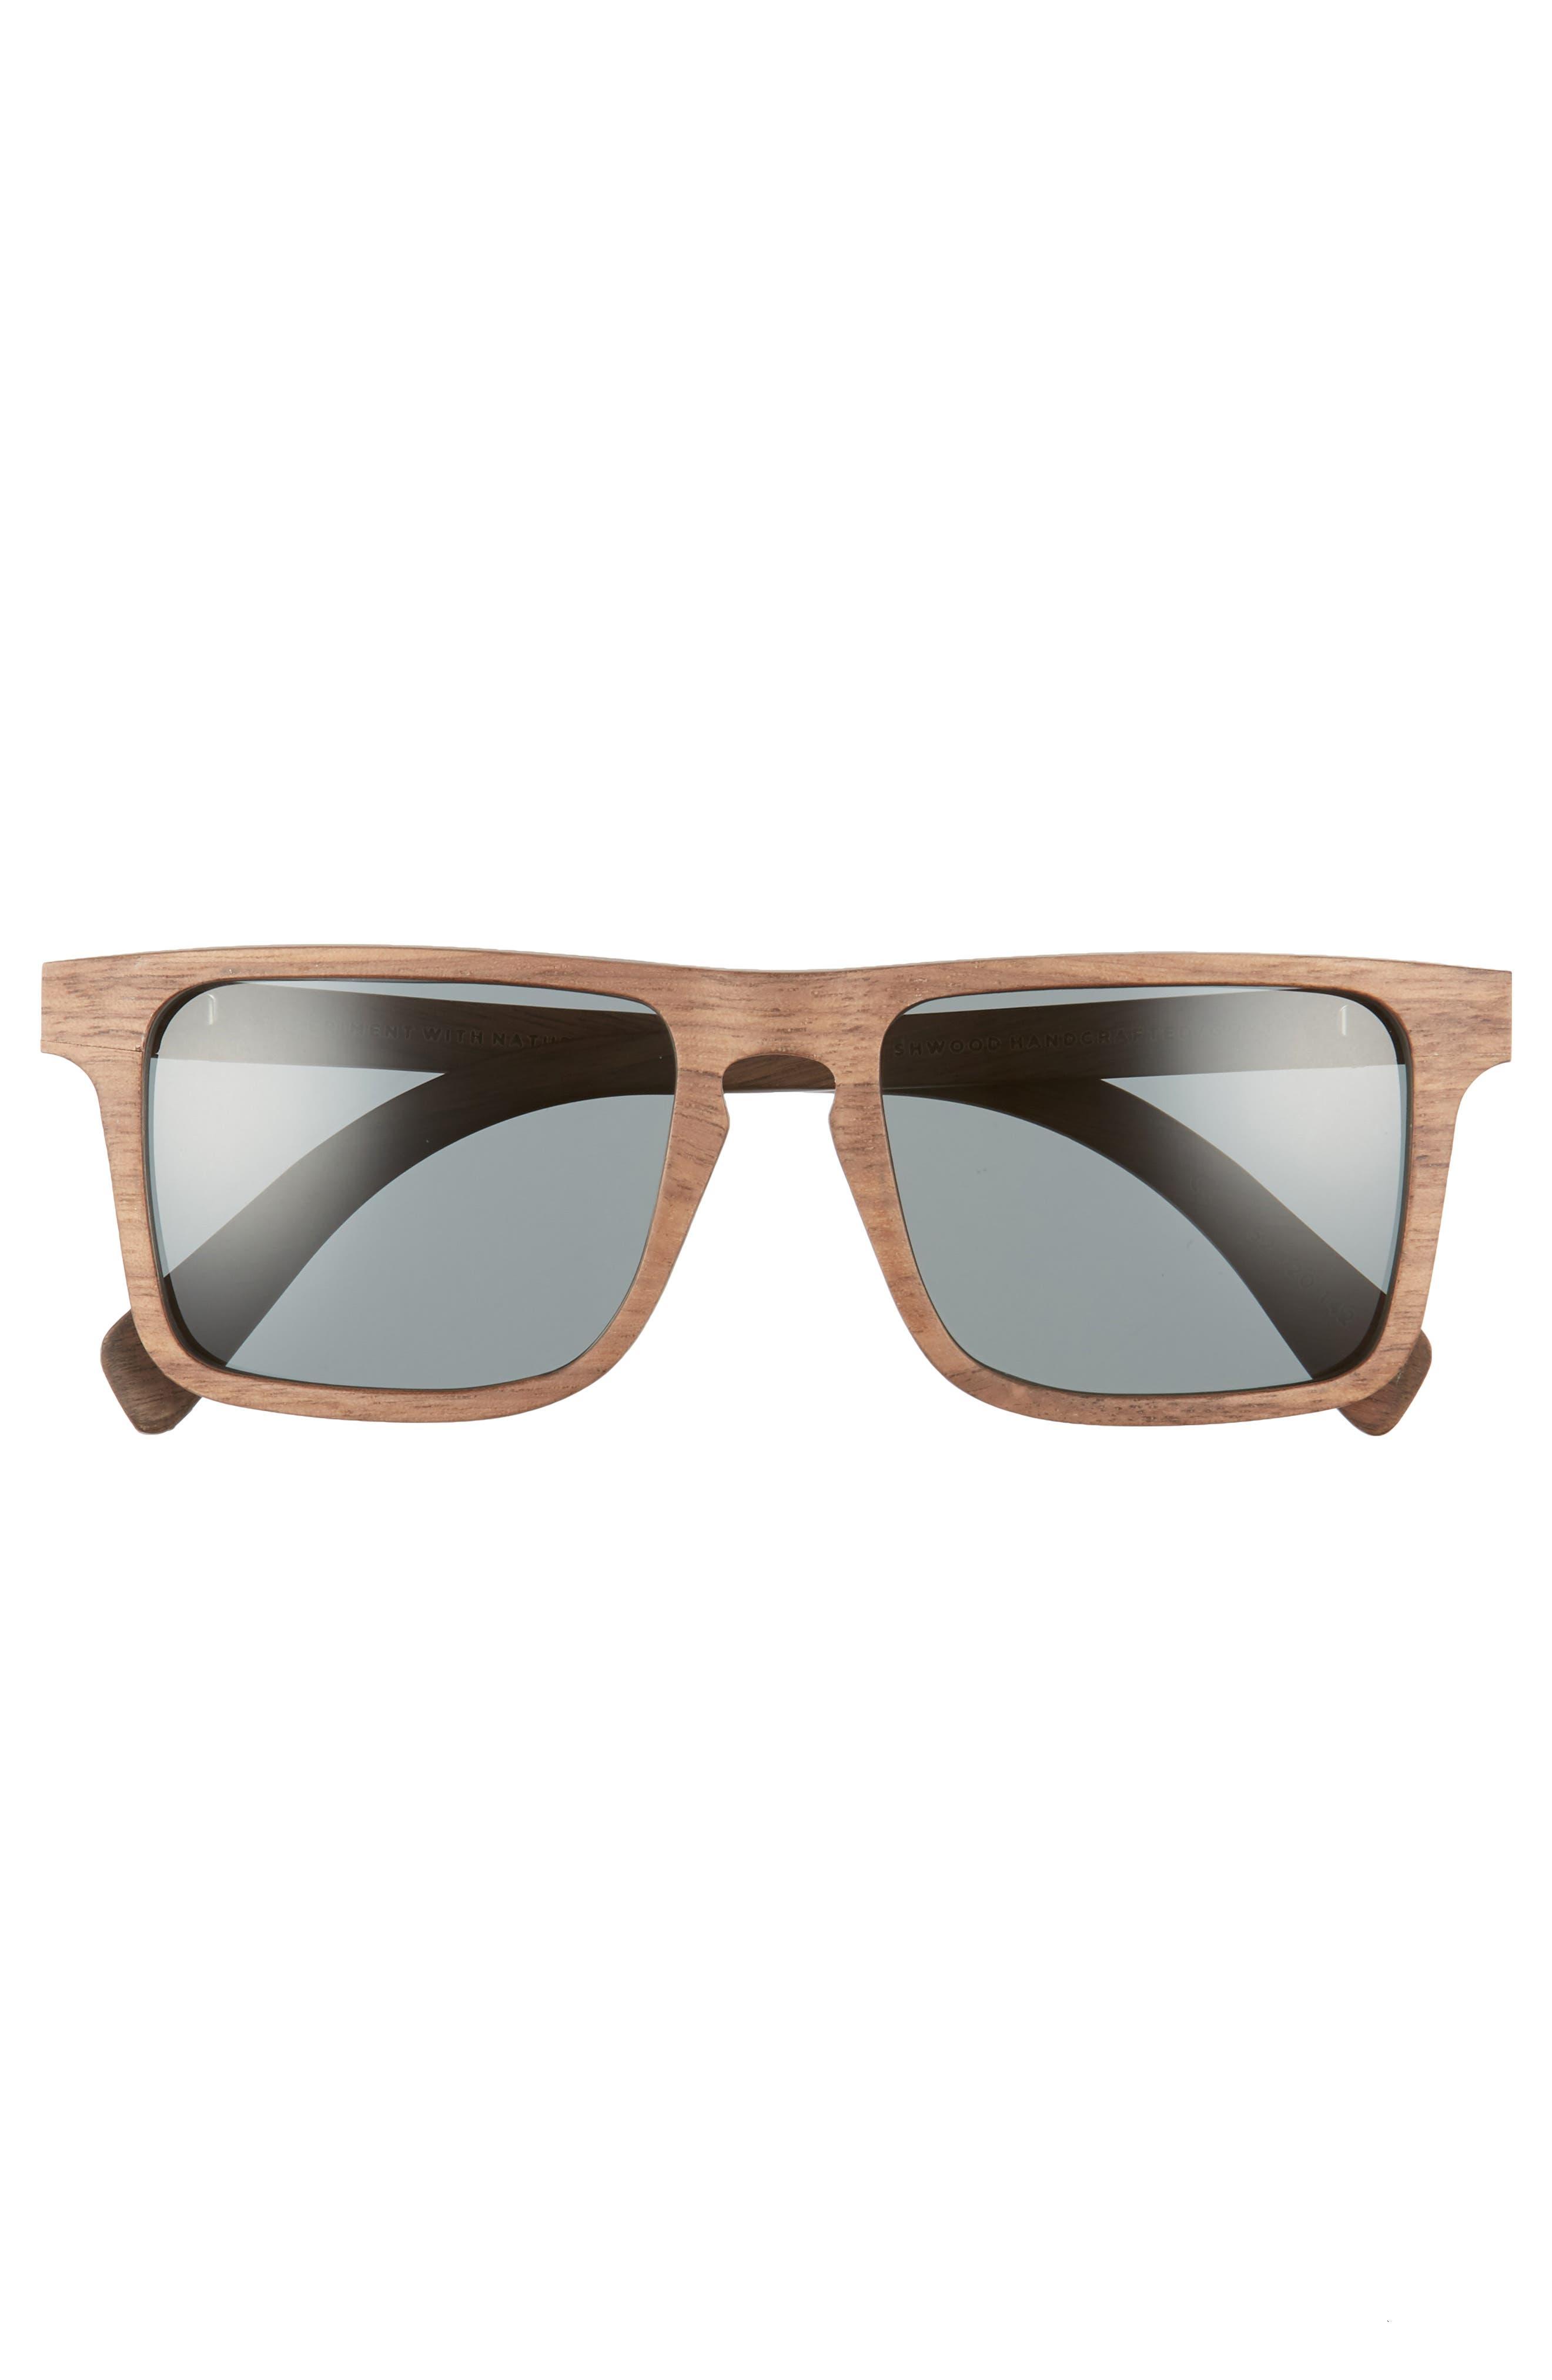 Govy 2 52mm Polarized Wood Sunglasses,                             Alternate thumbnail 2, color,                             Walnut/ Grey